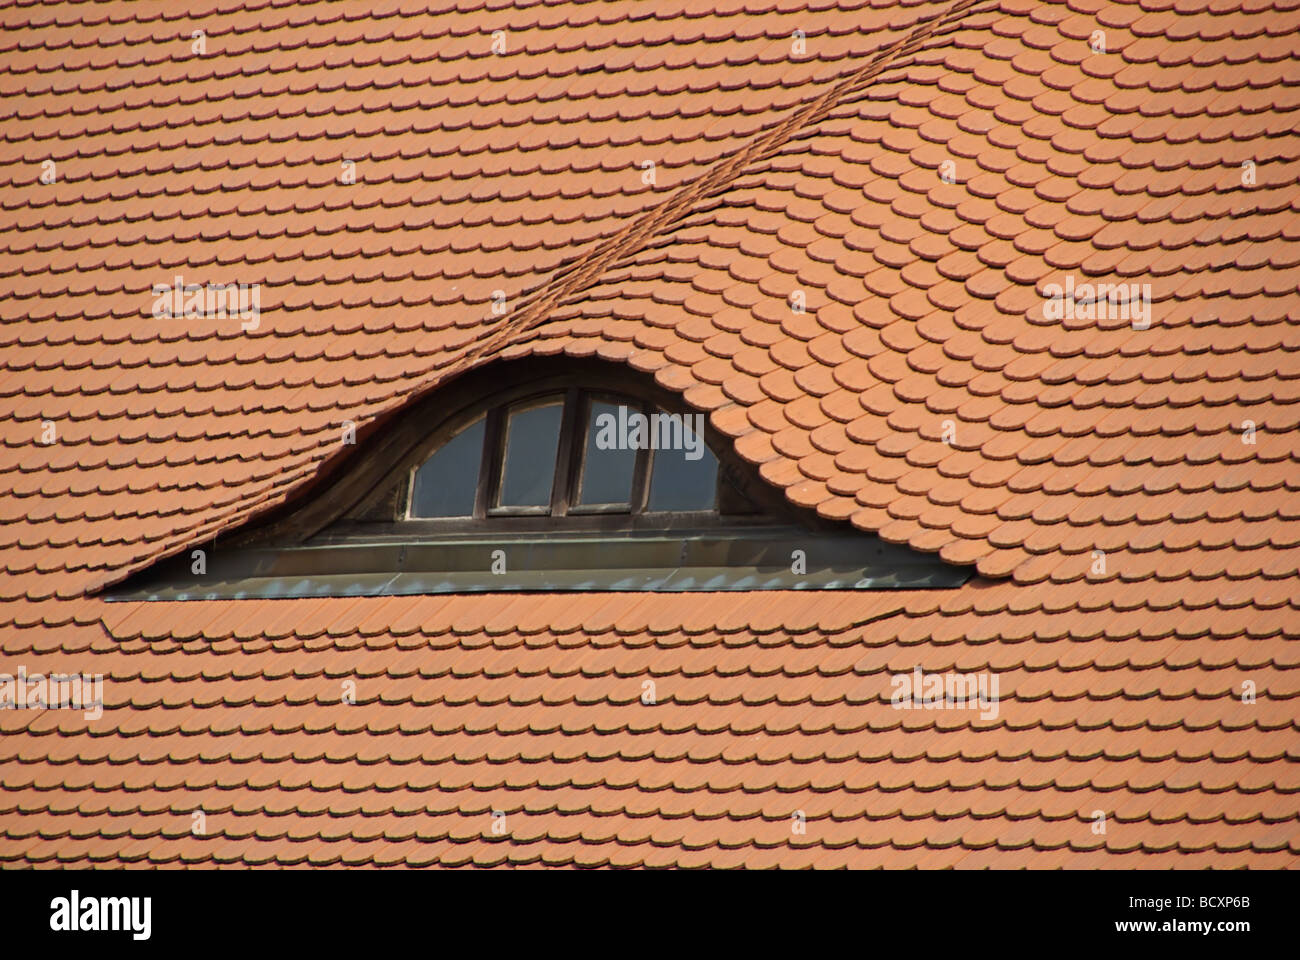 Fenster window 18 - Stock Image